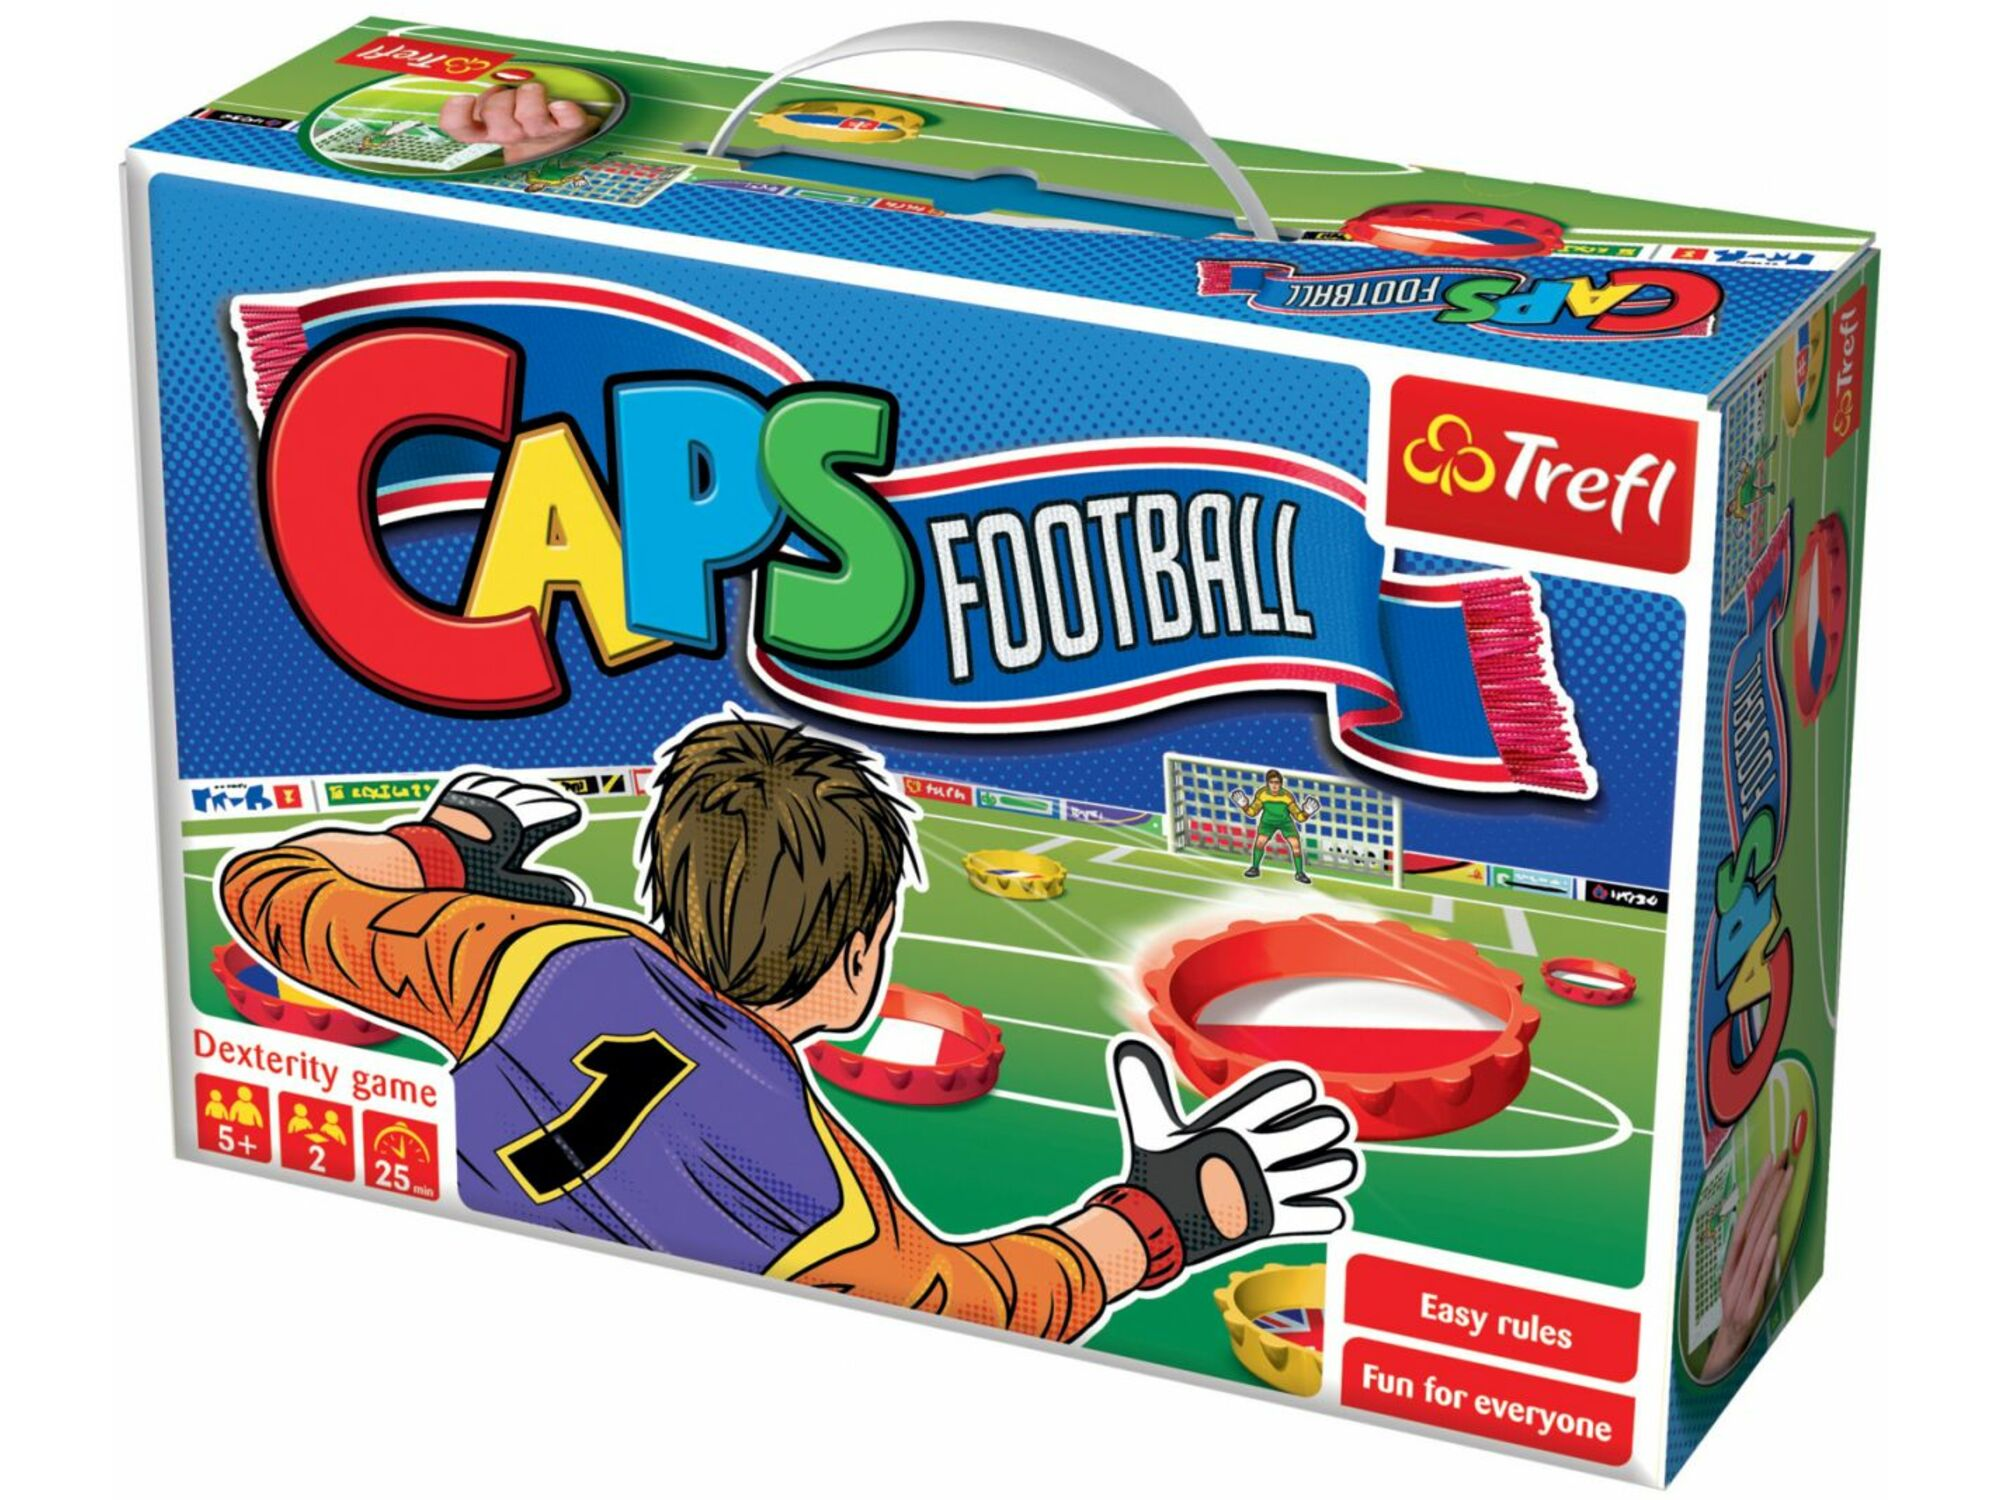 Caps Football igra 12-014921